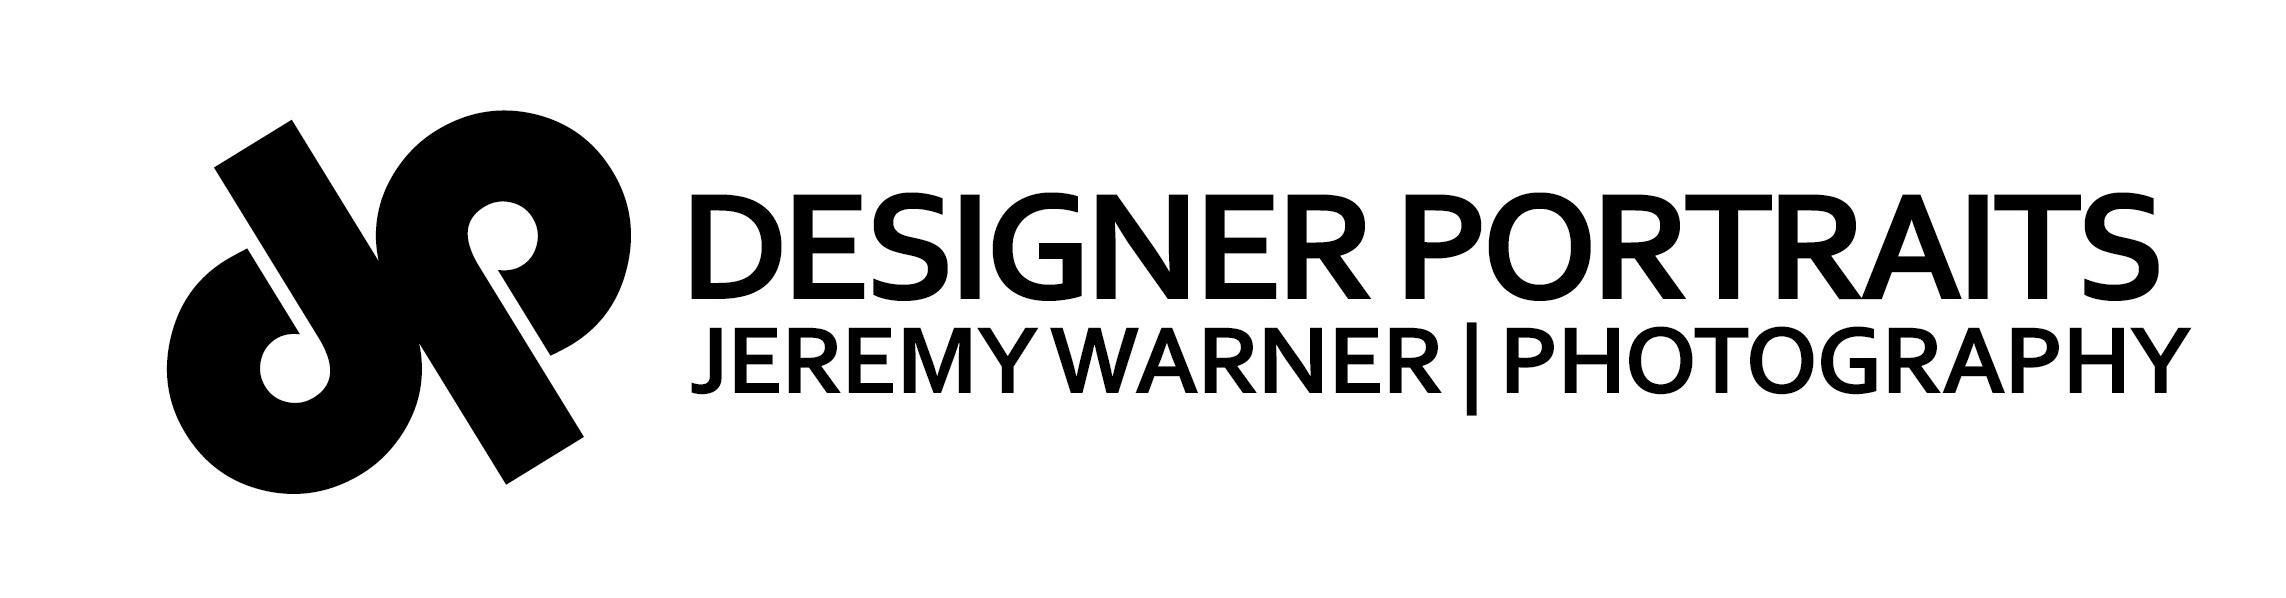 Jeremy Warner